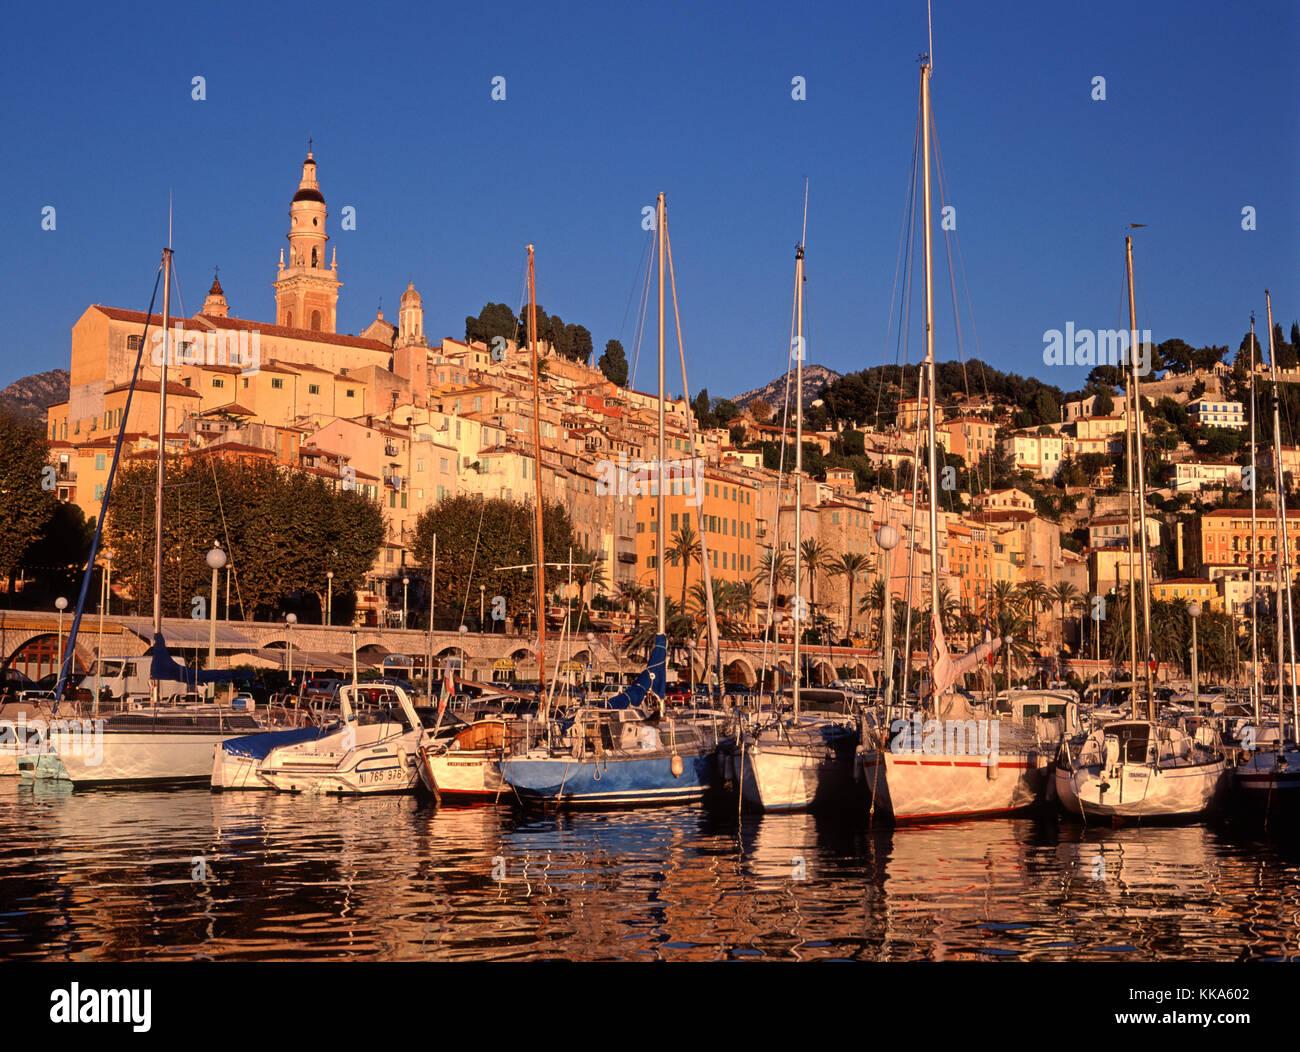 Menton marina, Côte d'Azur, Alpes Maritimes, French Riviera, France - Stock Image